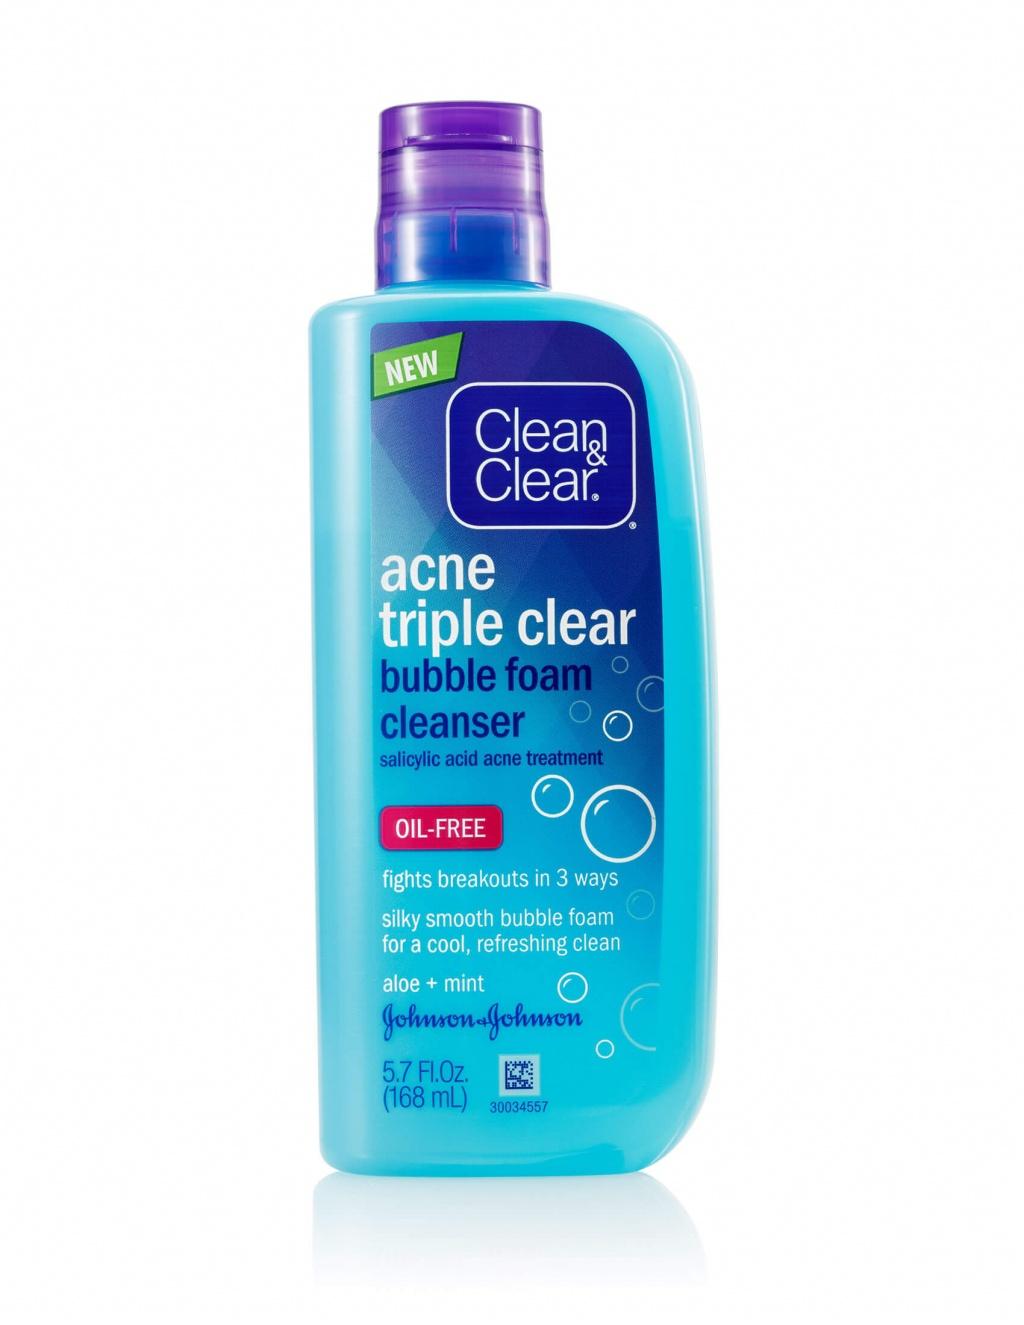 Clean & Clear Acne Triple Clear™ Bubble Foam Cleanser